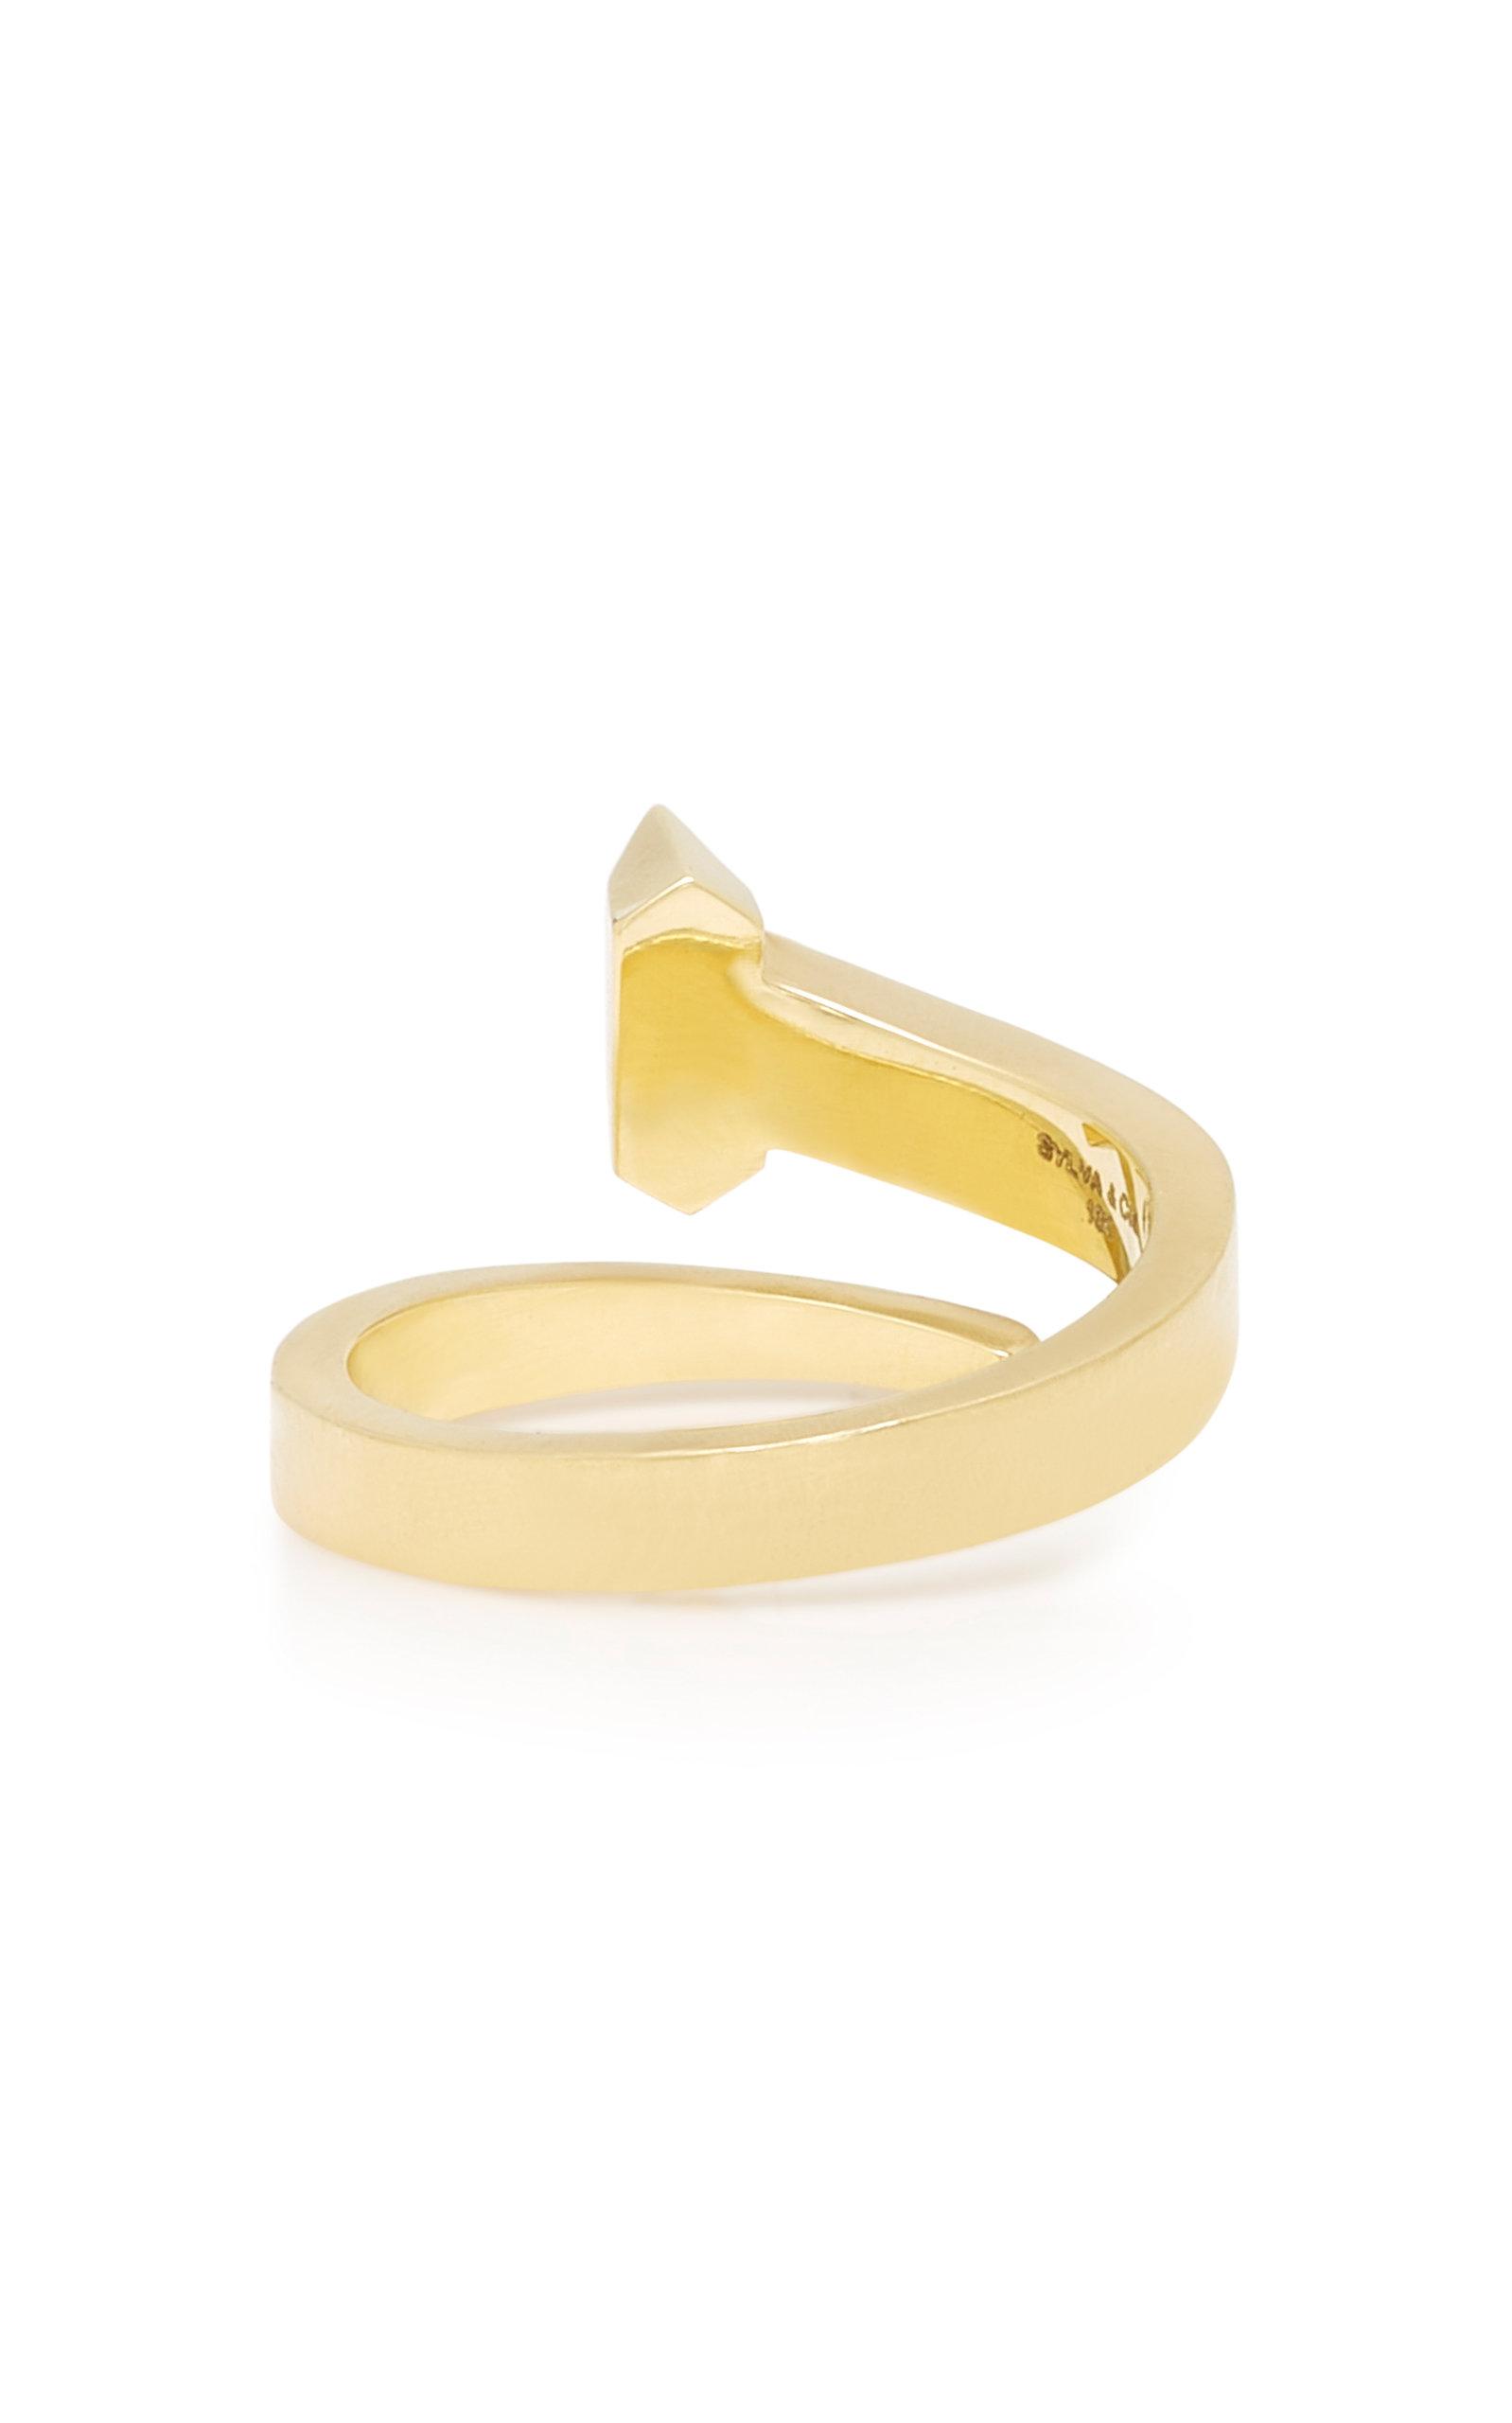 Equestrian 18K Gold Diamond Ring Sylva & Cie. kZuy8K7q